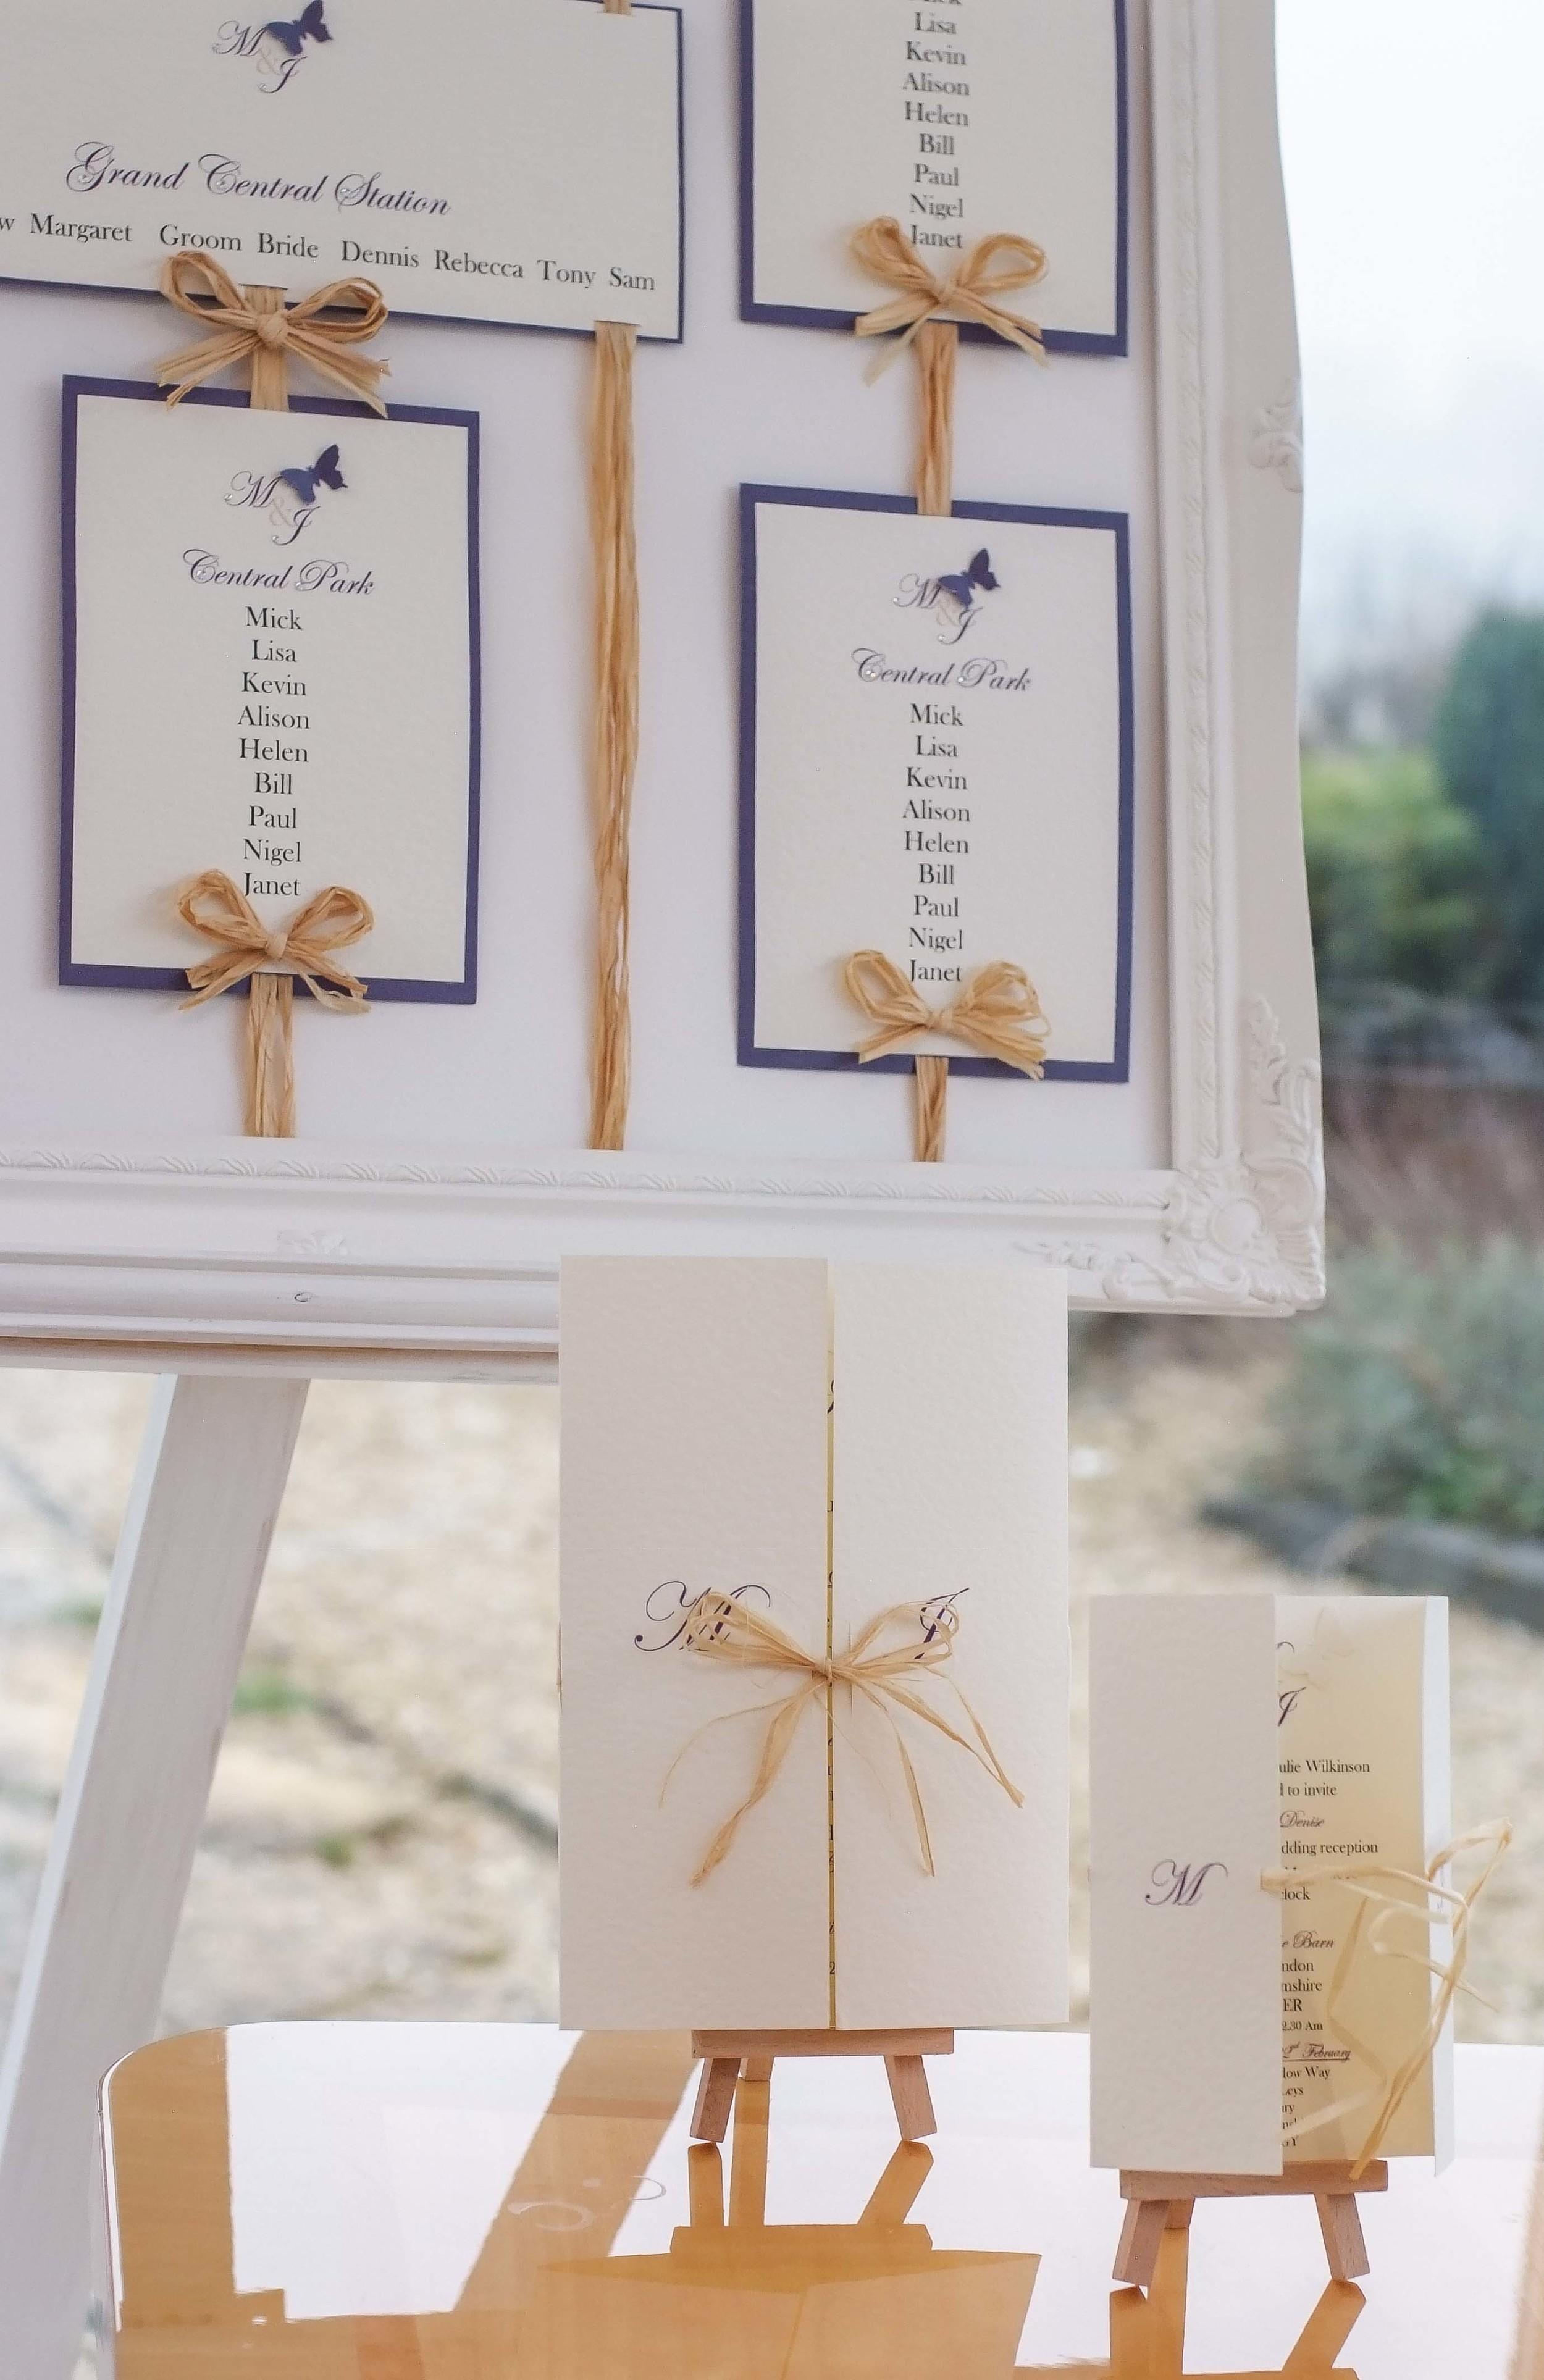 Cadbury's Purple Rustic Wedding Invitation in the Rustic Elegance collection from VivienB's